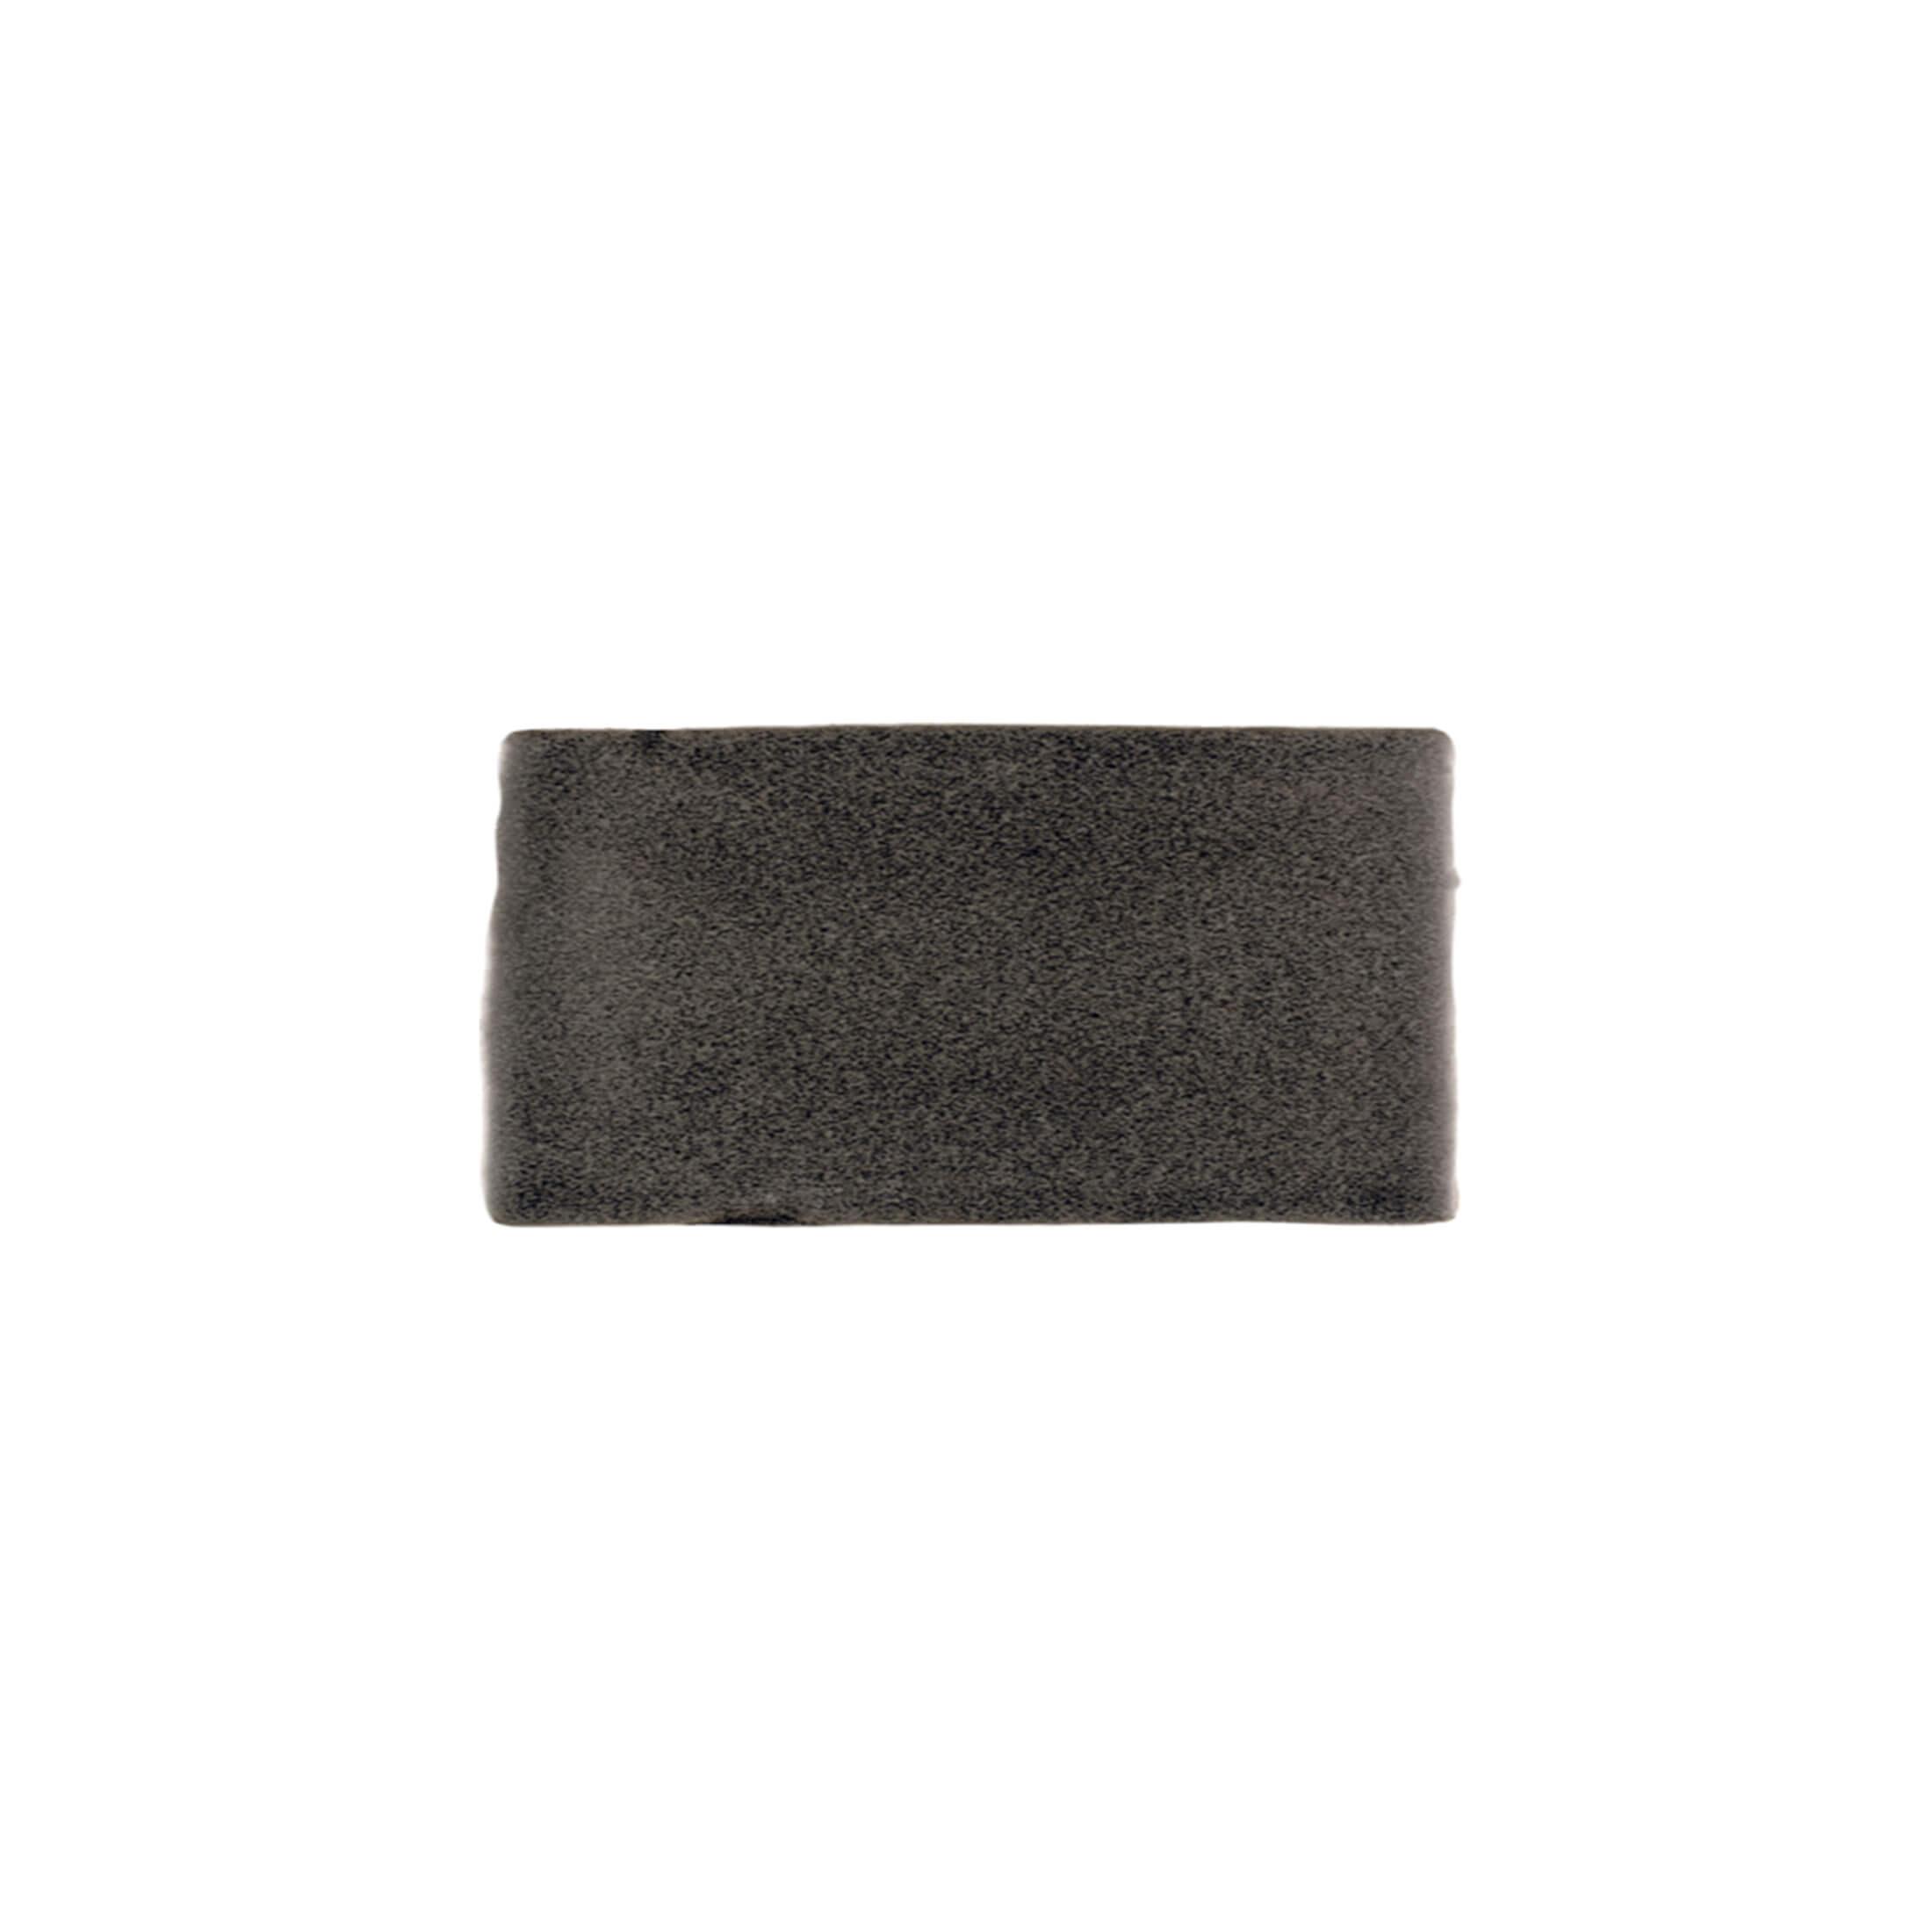 ADNT1006 - LISO  - 7.5 cm X 15 cm